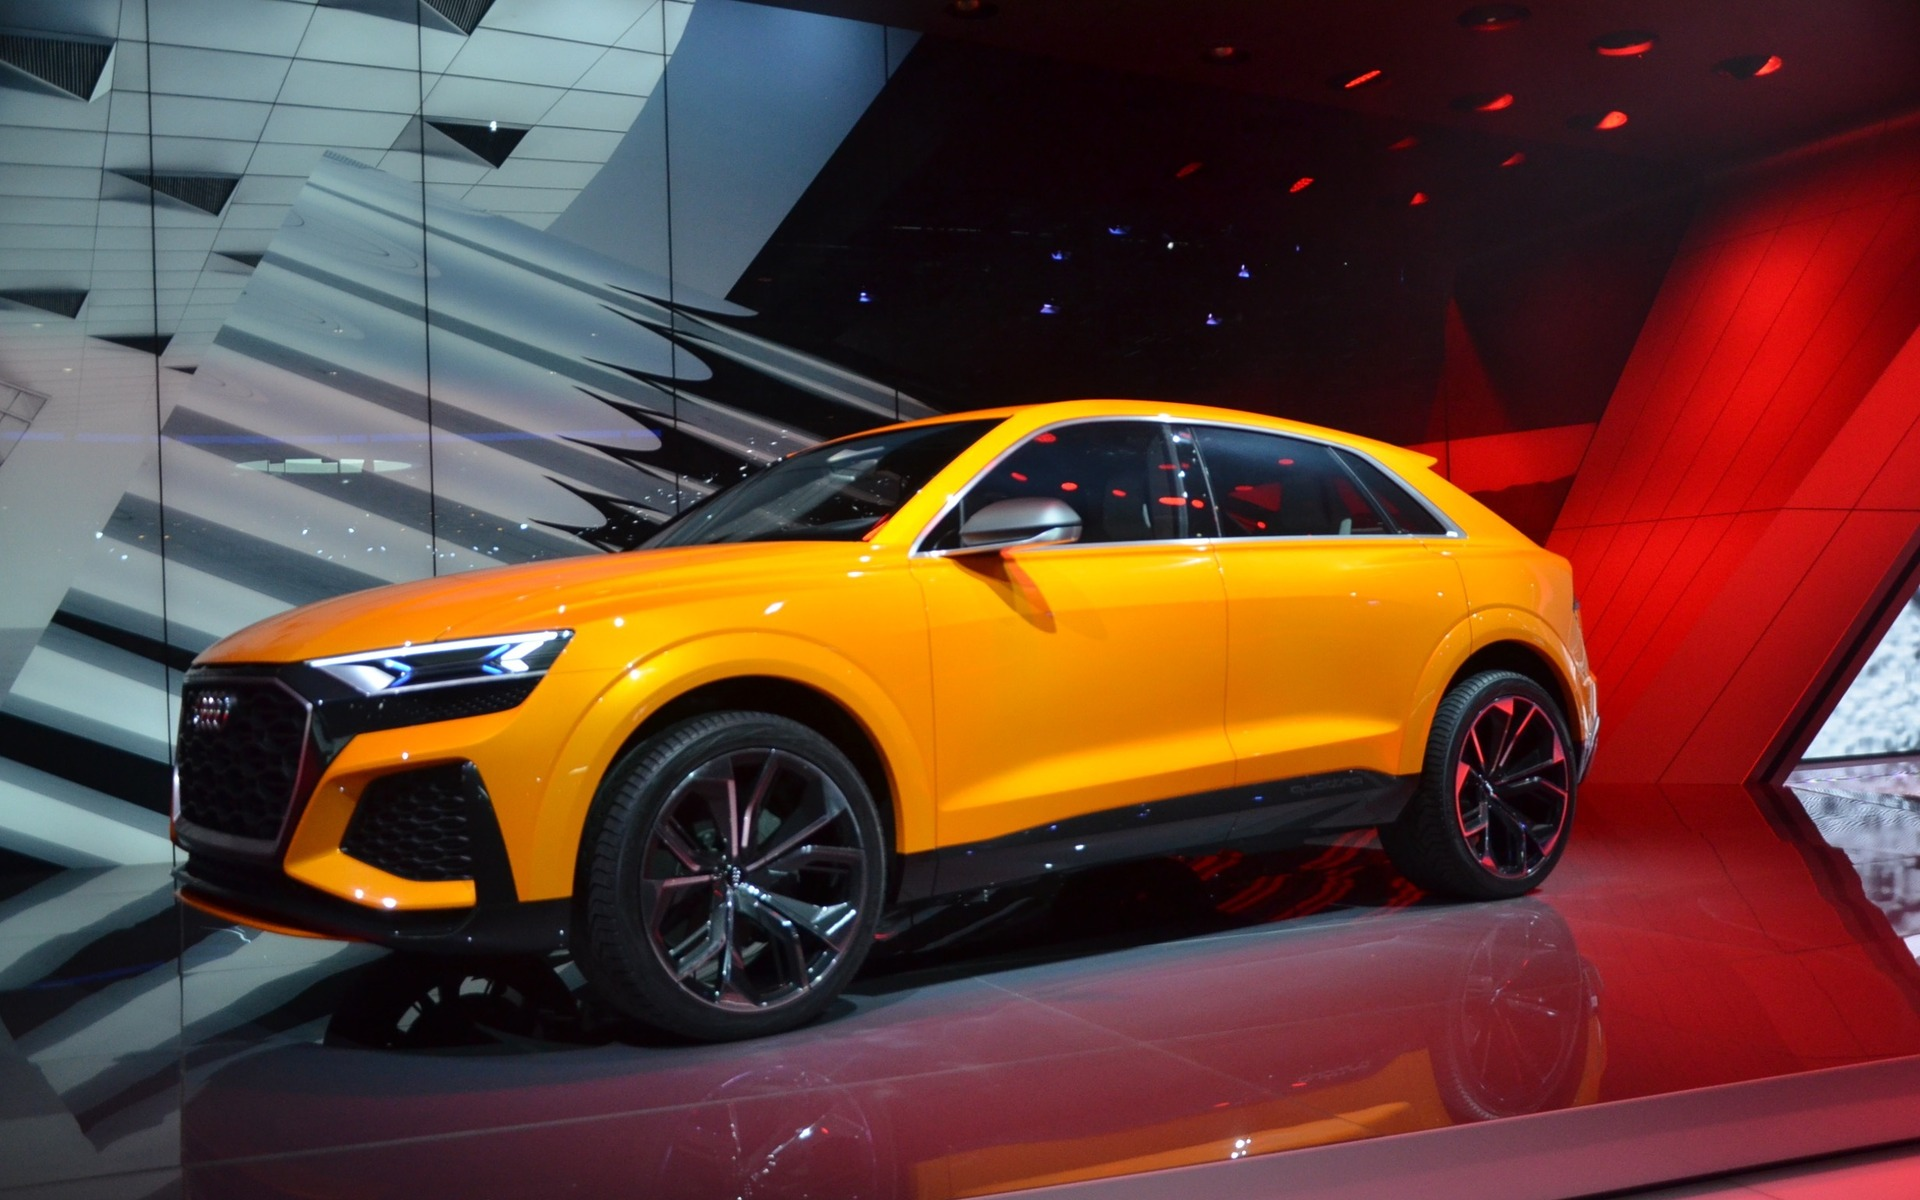 Audi Rs 8 2017 >> 2018 Audi RS 5 Coupé and Q8 sport concept: World Premieres in Geneva - 13/16